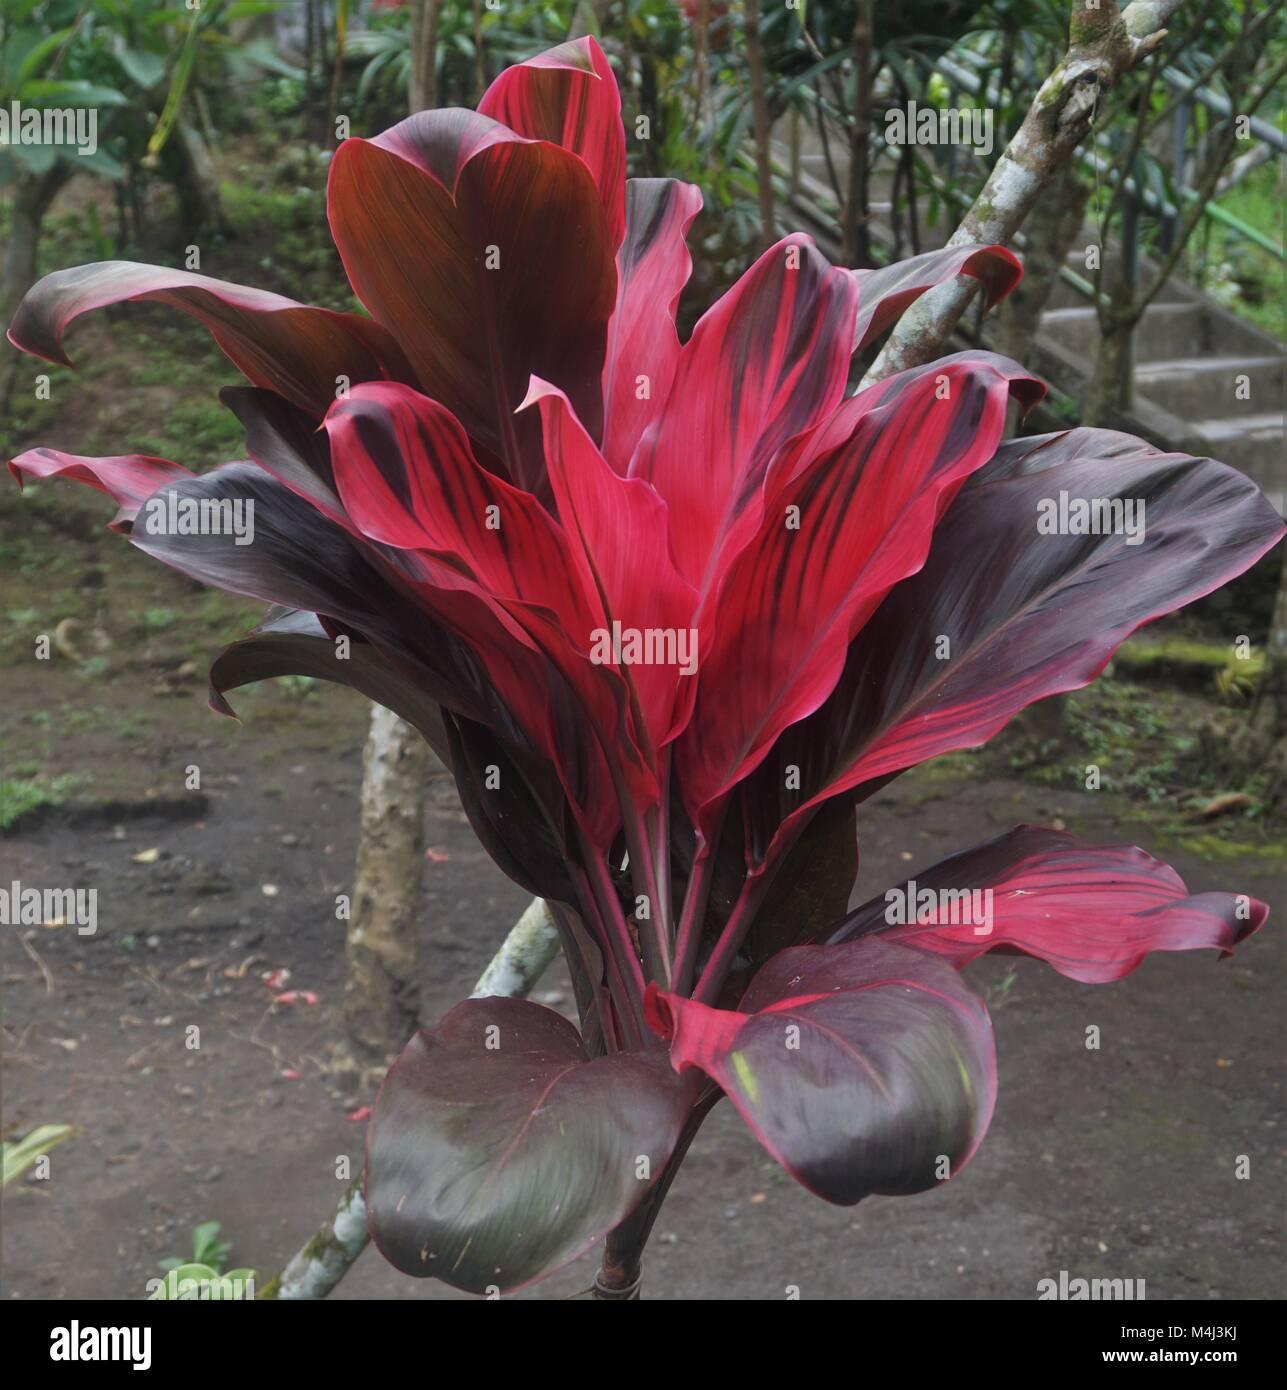 pflanze mit roten bl tter in bali indonesien stockfoto bild 174960342 alamy. Black Bedroom Furniture Sets. Home Design Ideas